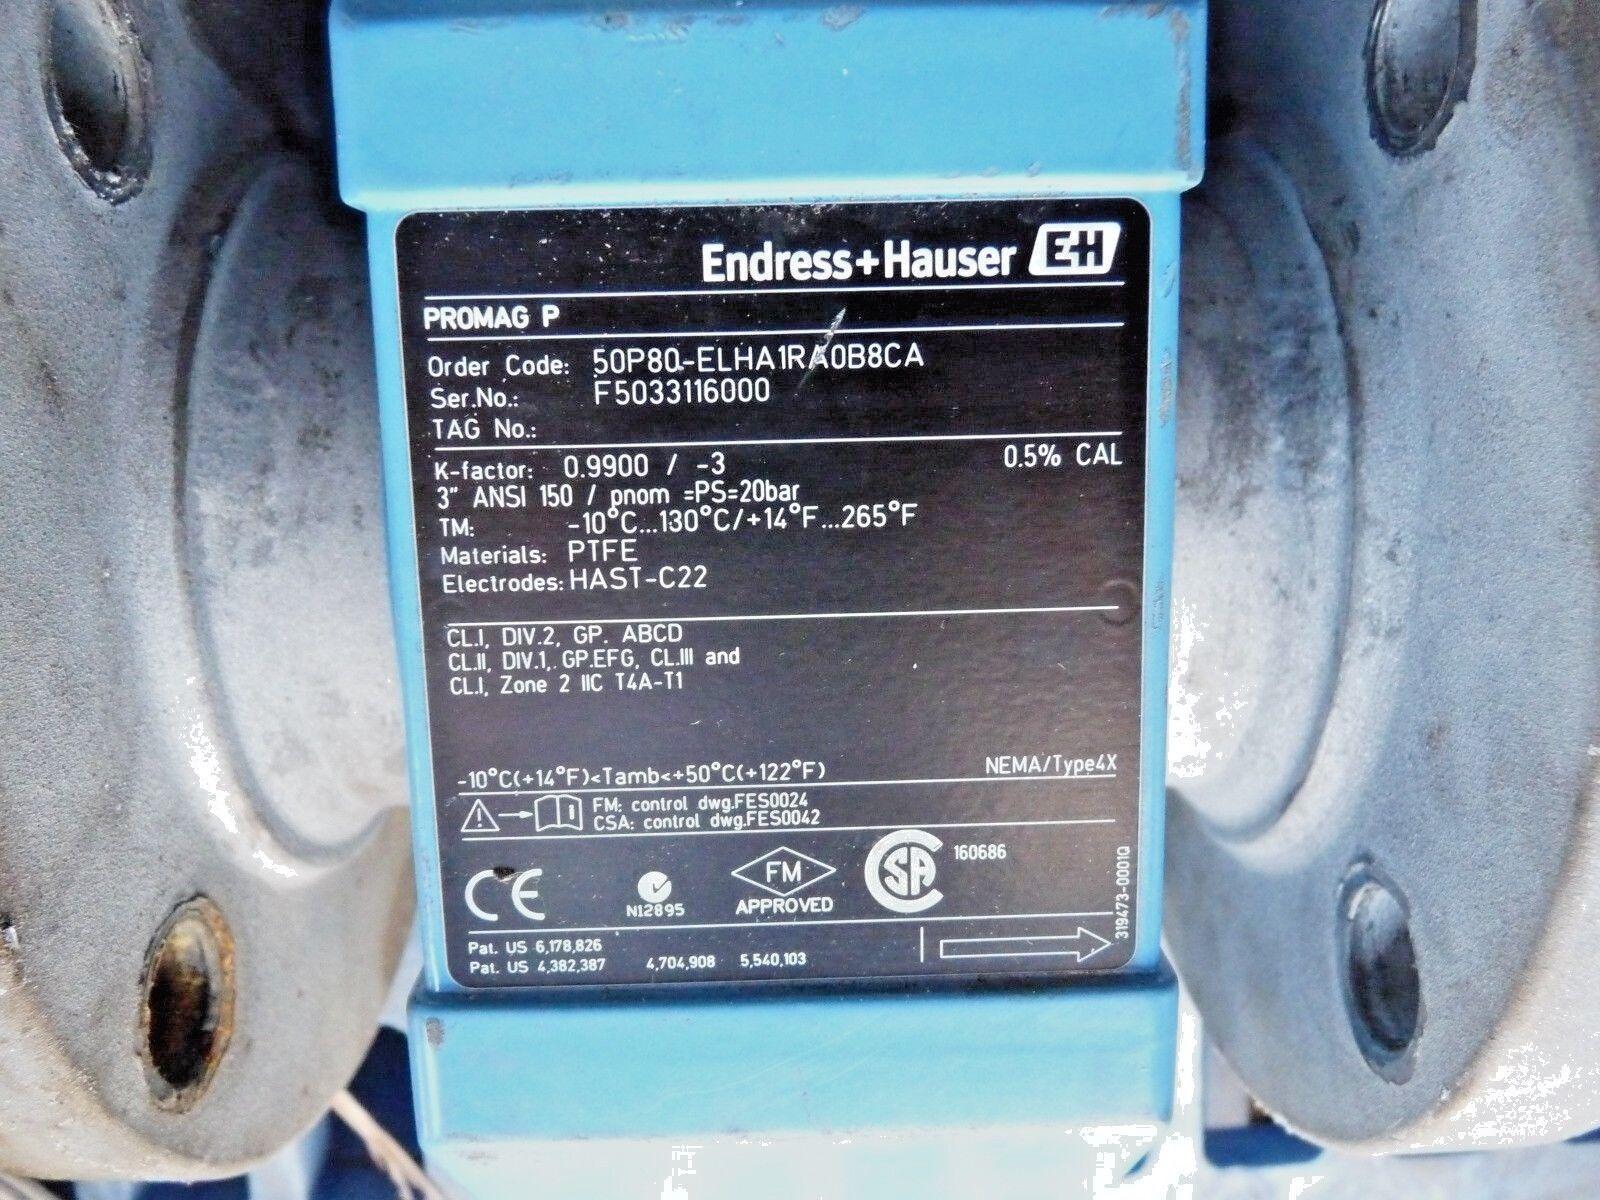 ENDRESS + HAUSER PROMAG 50P 50P80-ELHA1RA0B8CA ELECTROMAGNETIC FLOWMETER    Shopping Bin - Search eBay faster